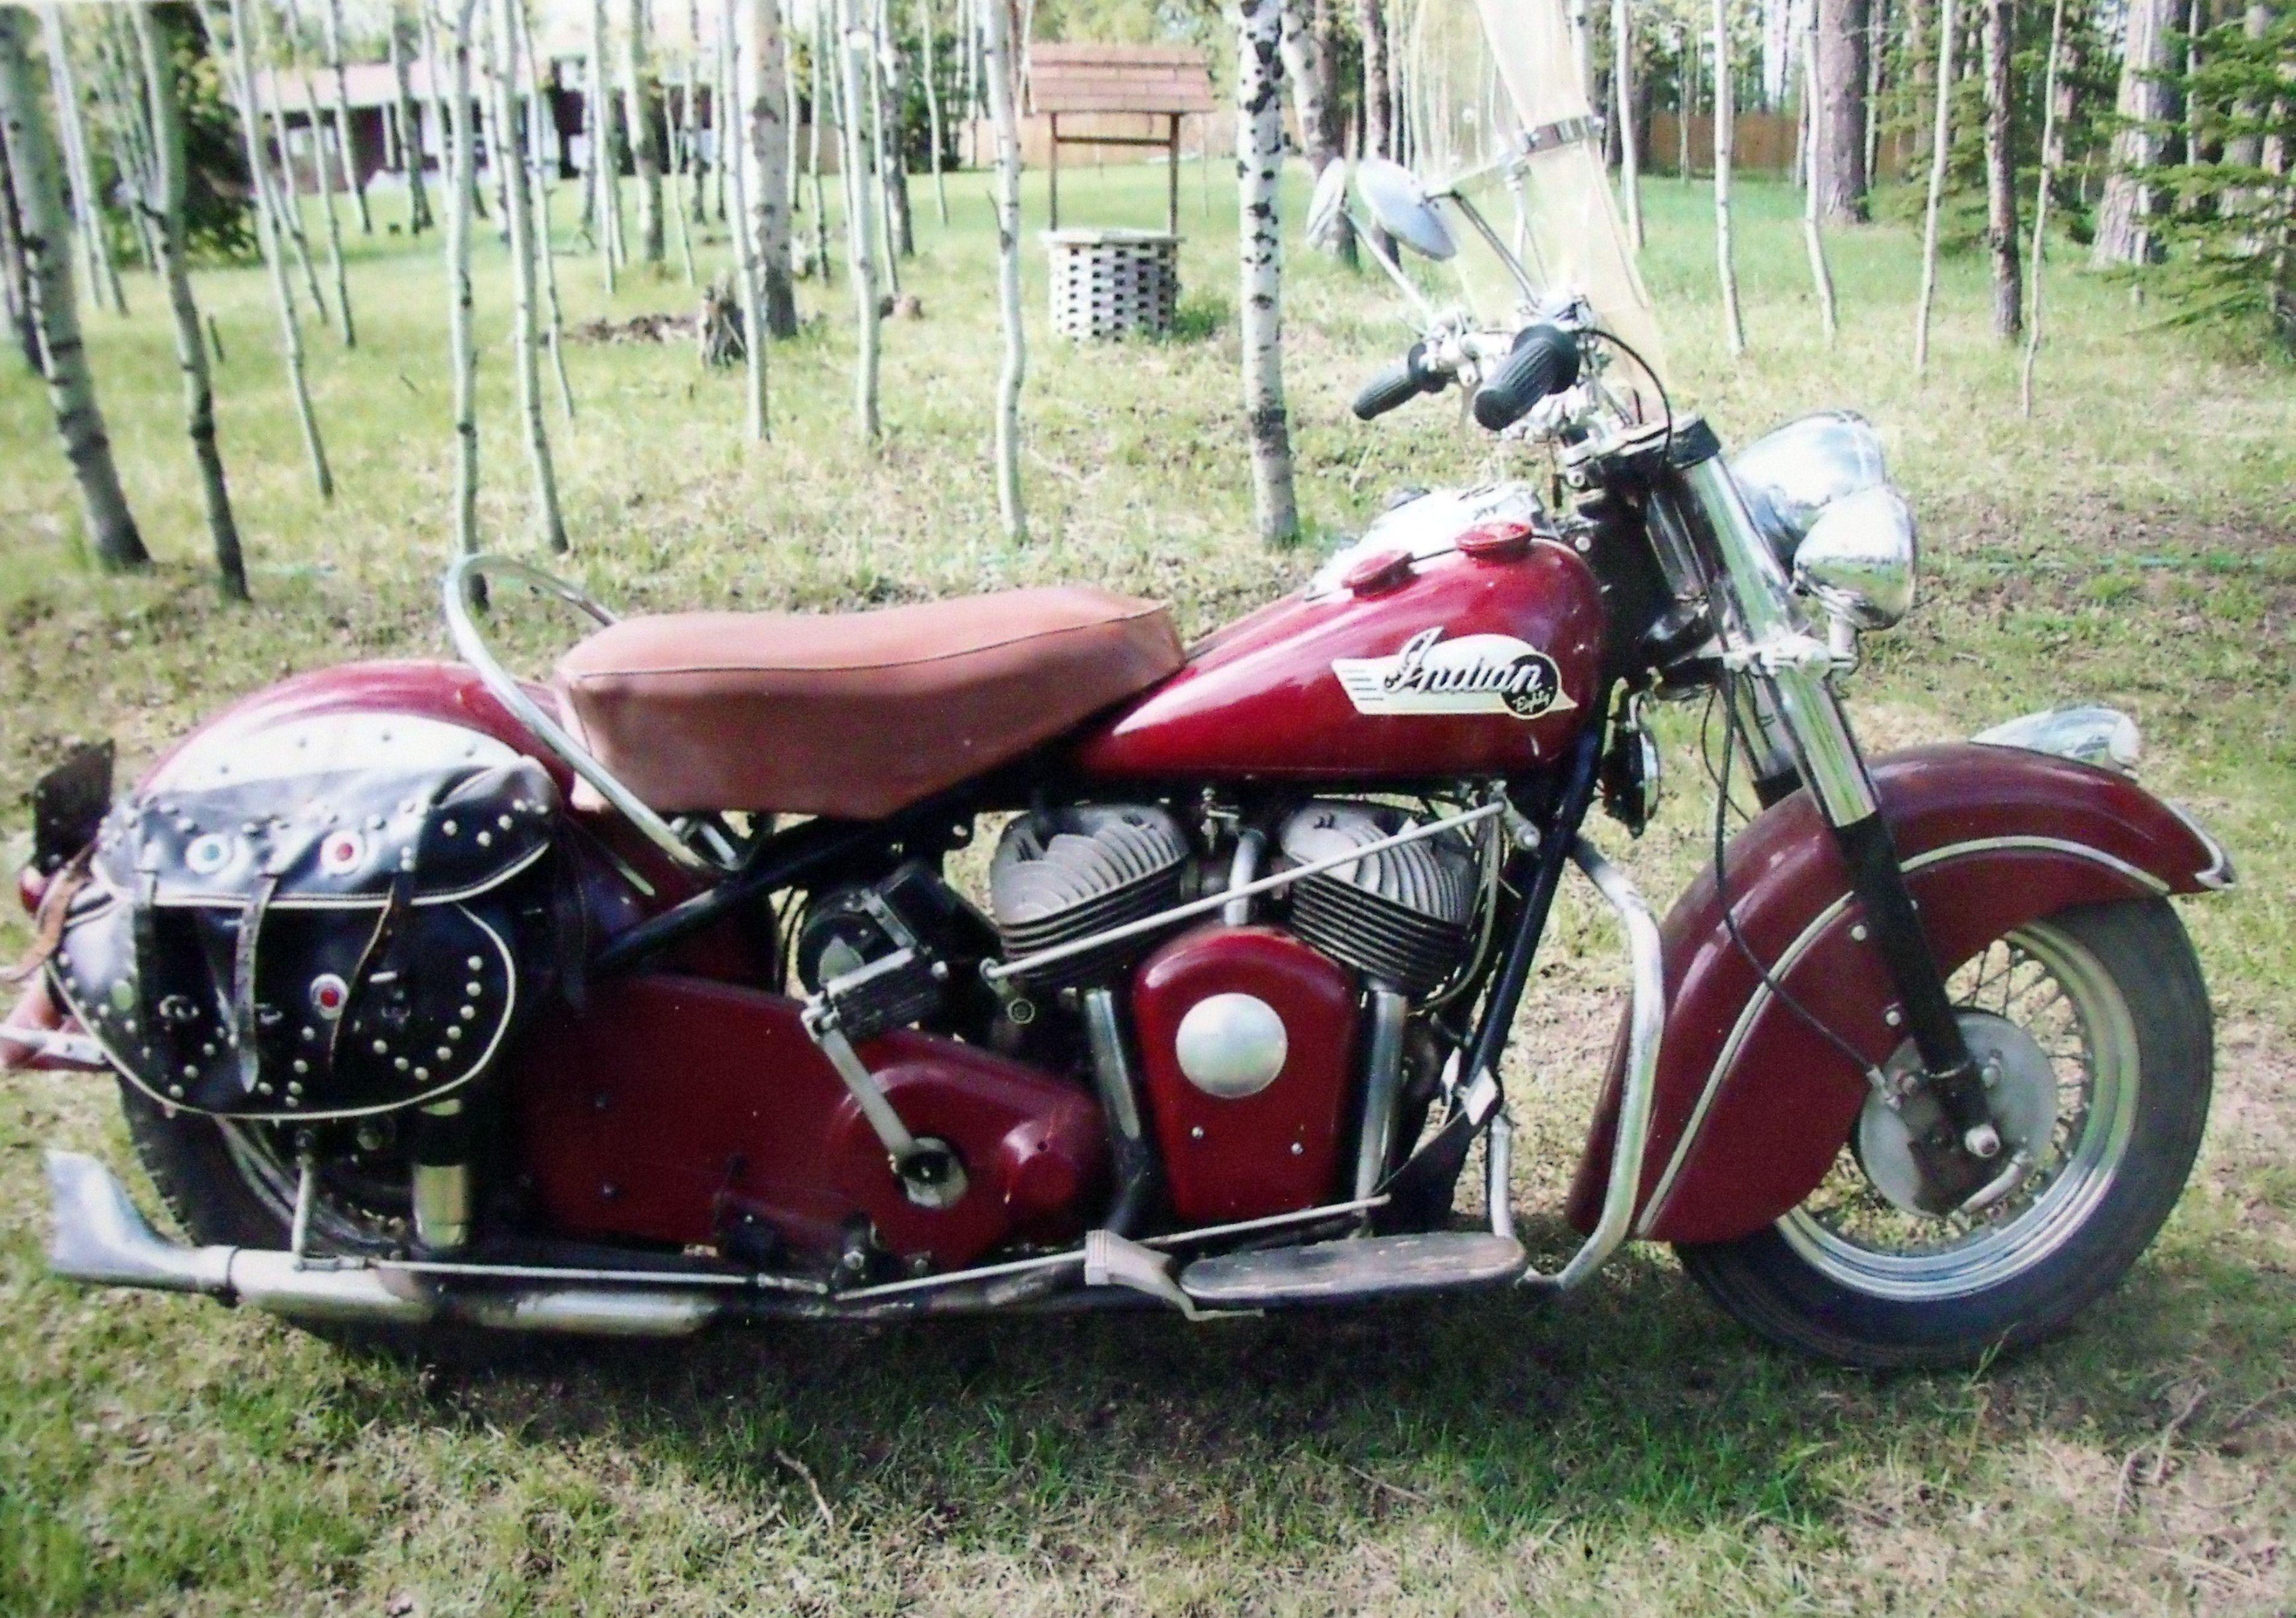 Pin On Motorcycles Circa 1950s